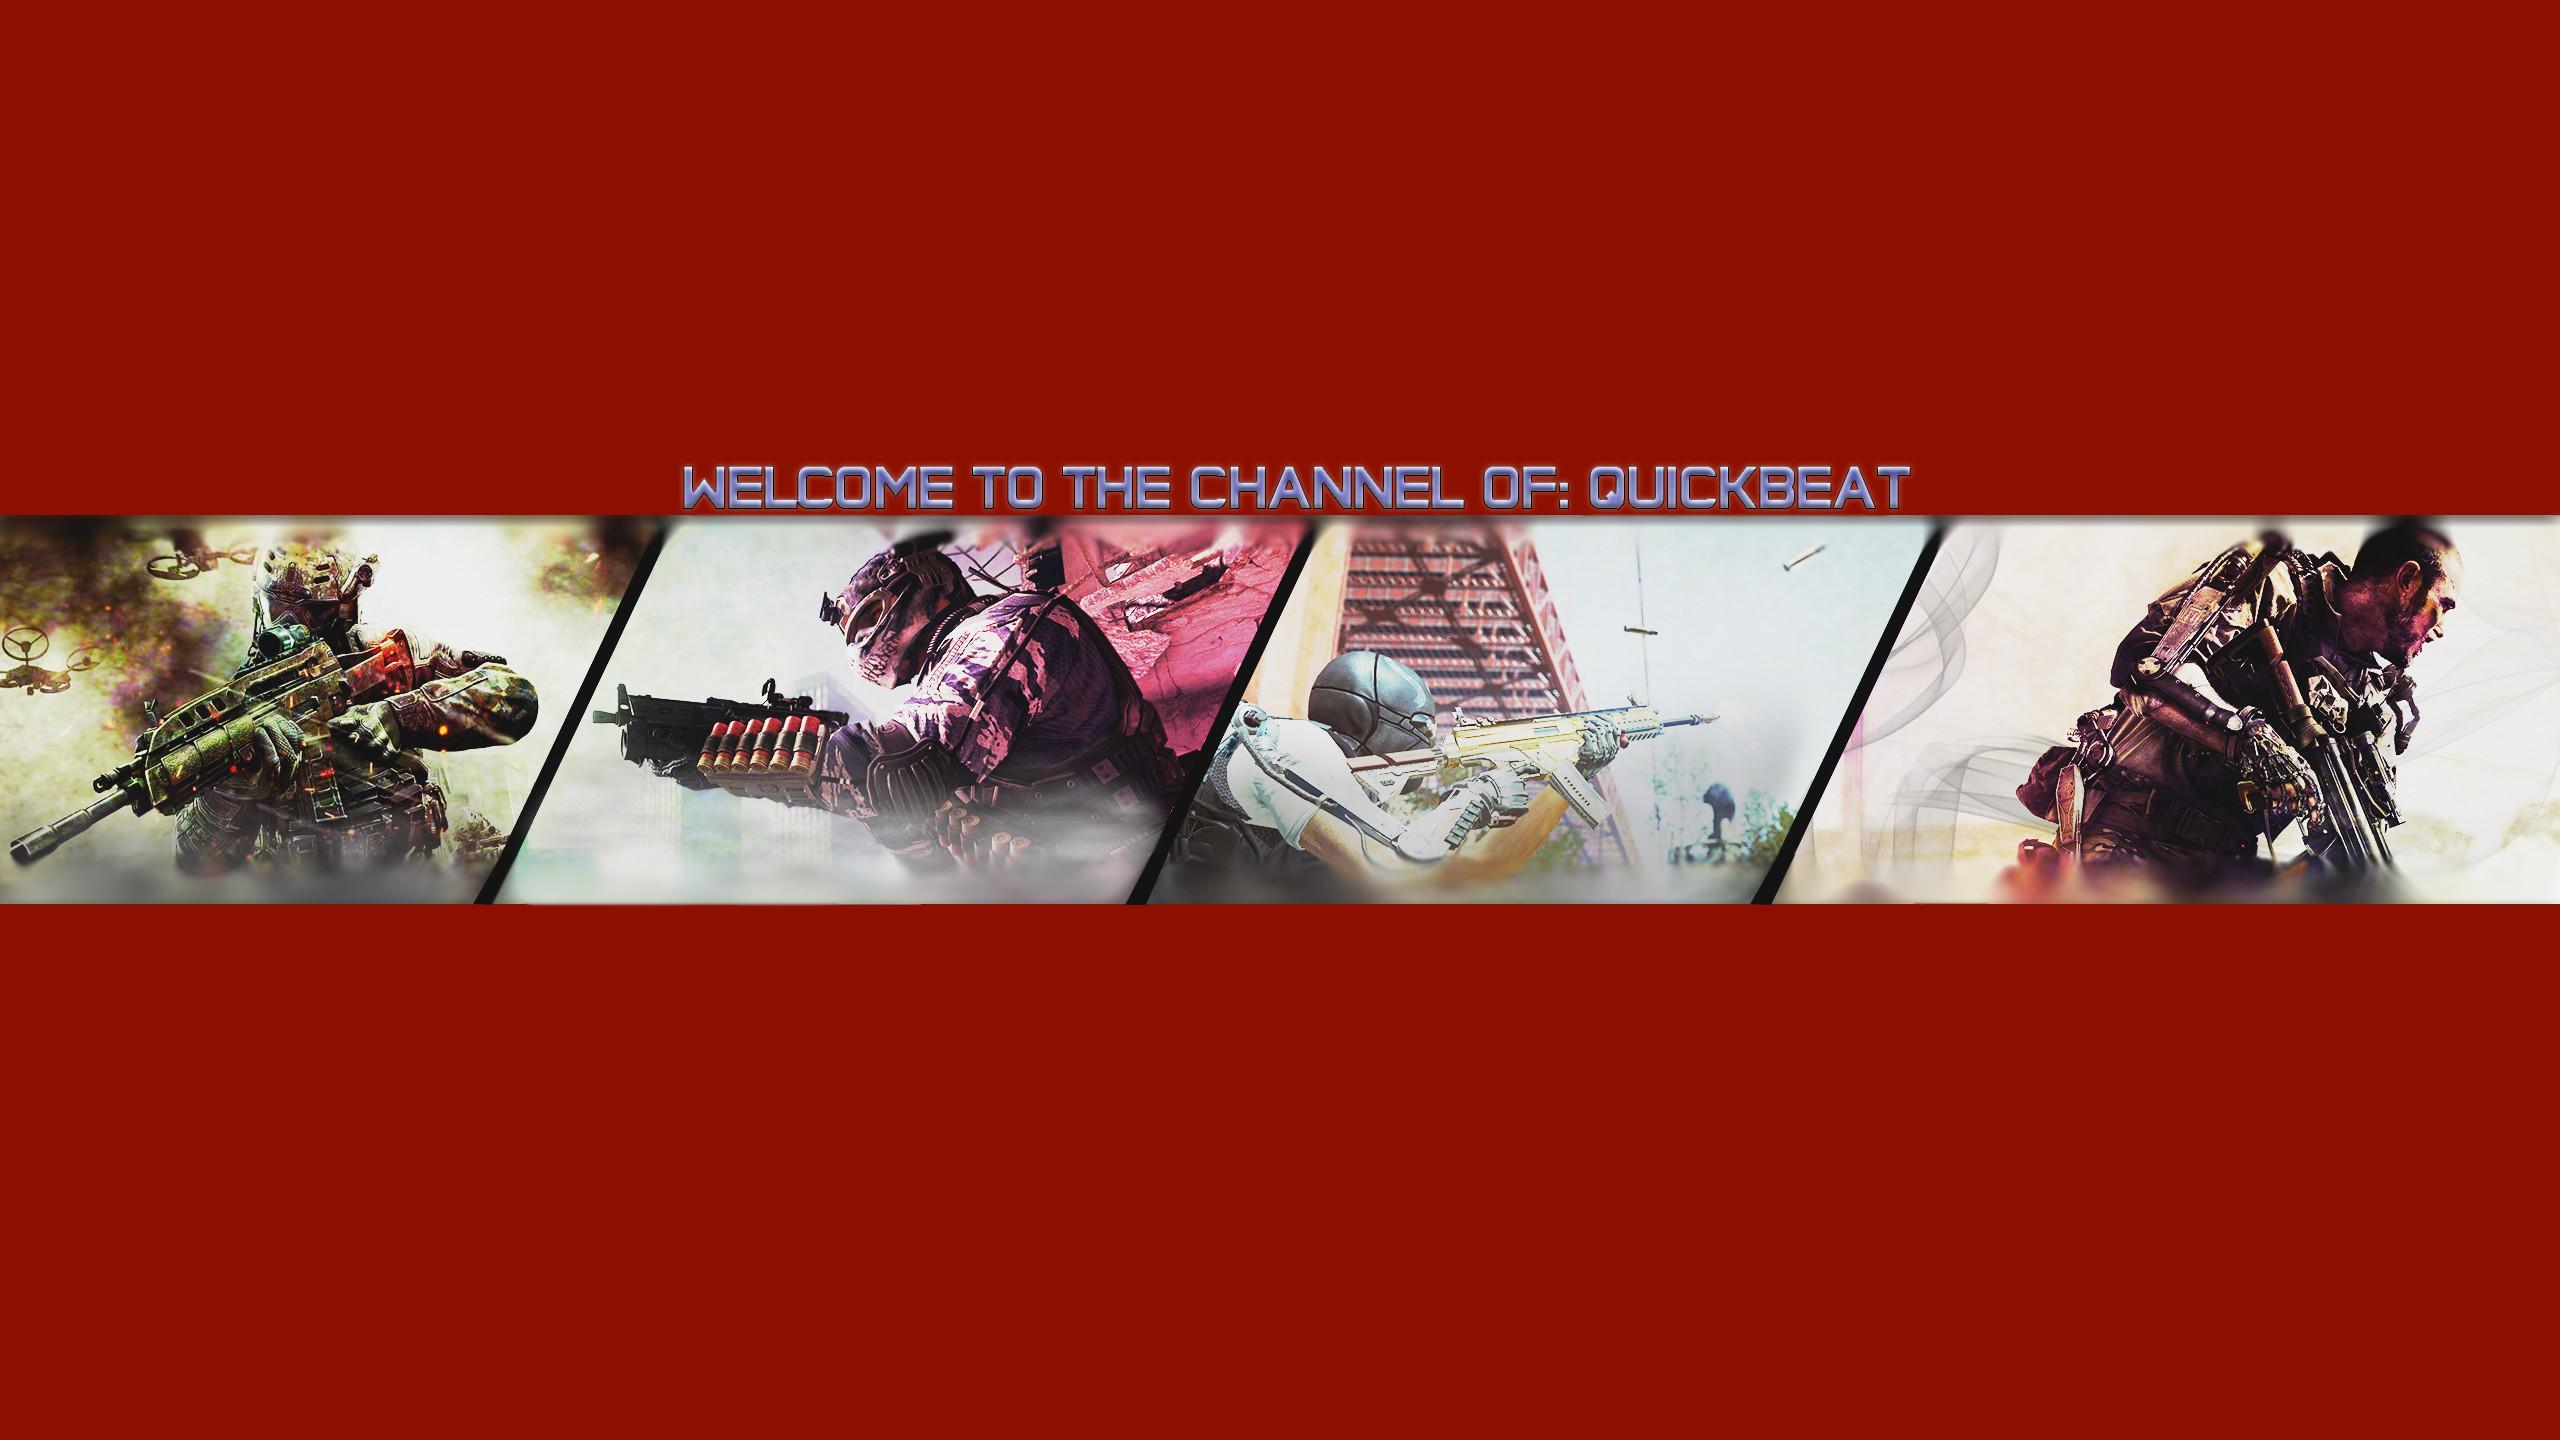 Youtube Banner Wallpaper (90+ Images